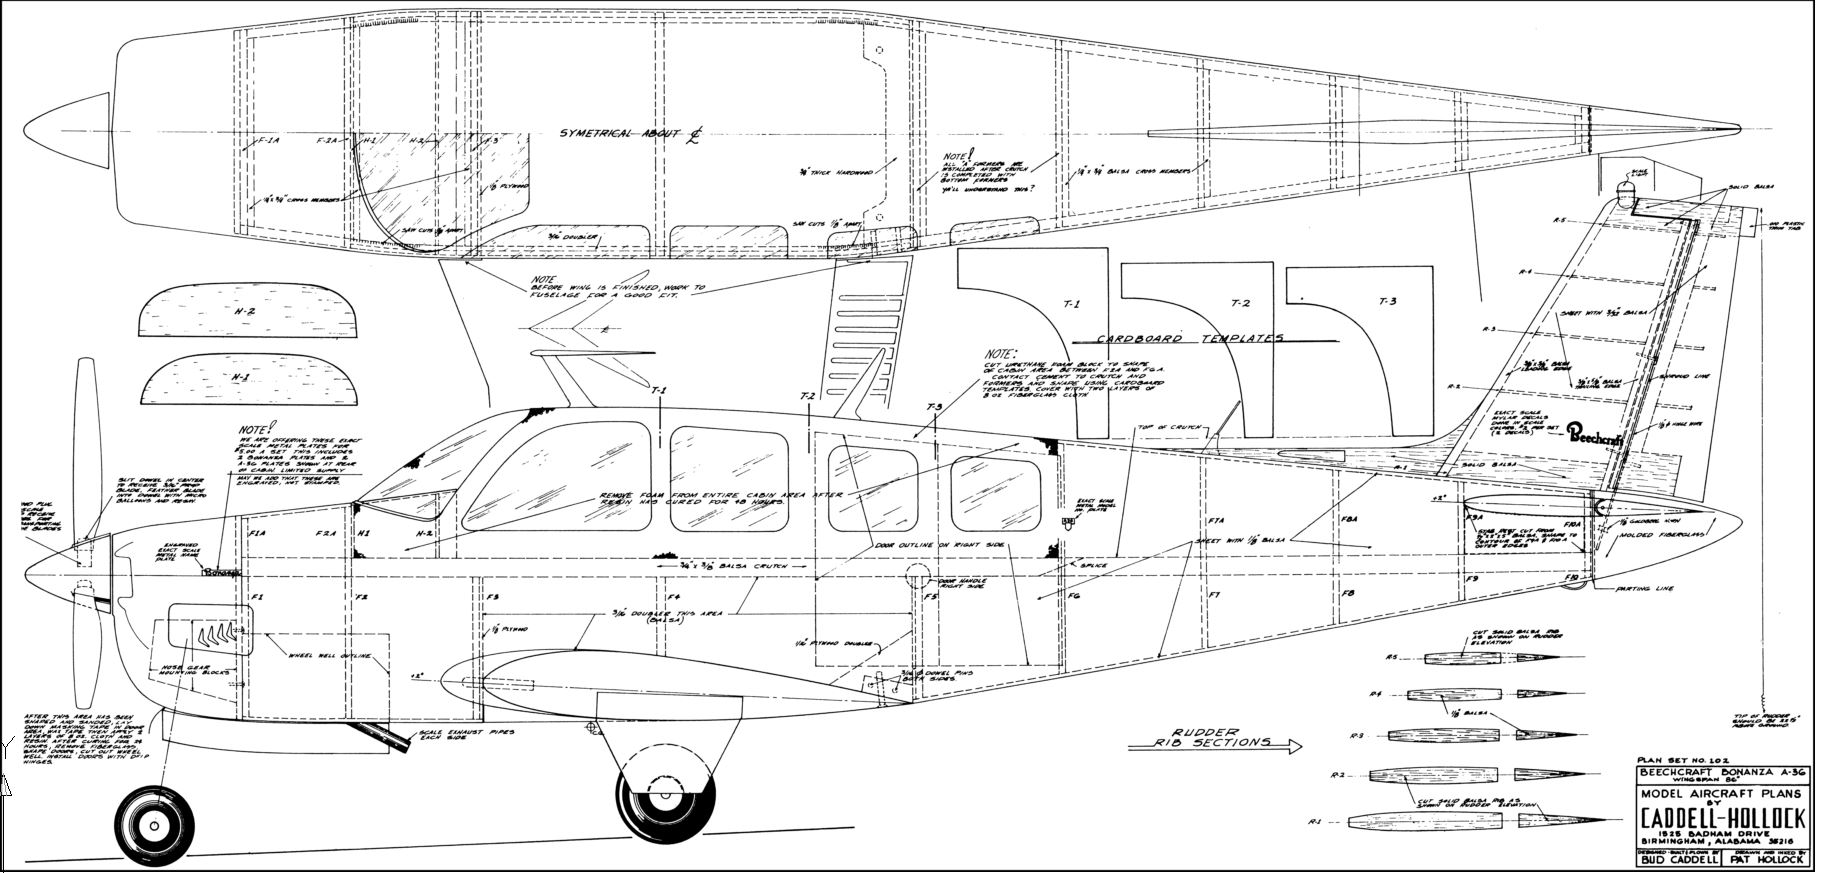 Click image for larger version  Name:Bonanza A-36 plan.JPG Views:316 Size:256.9 KB ID:2204784